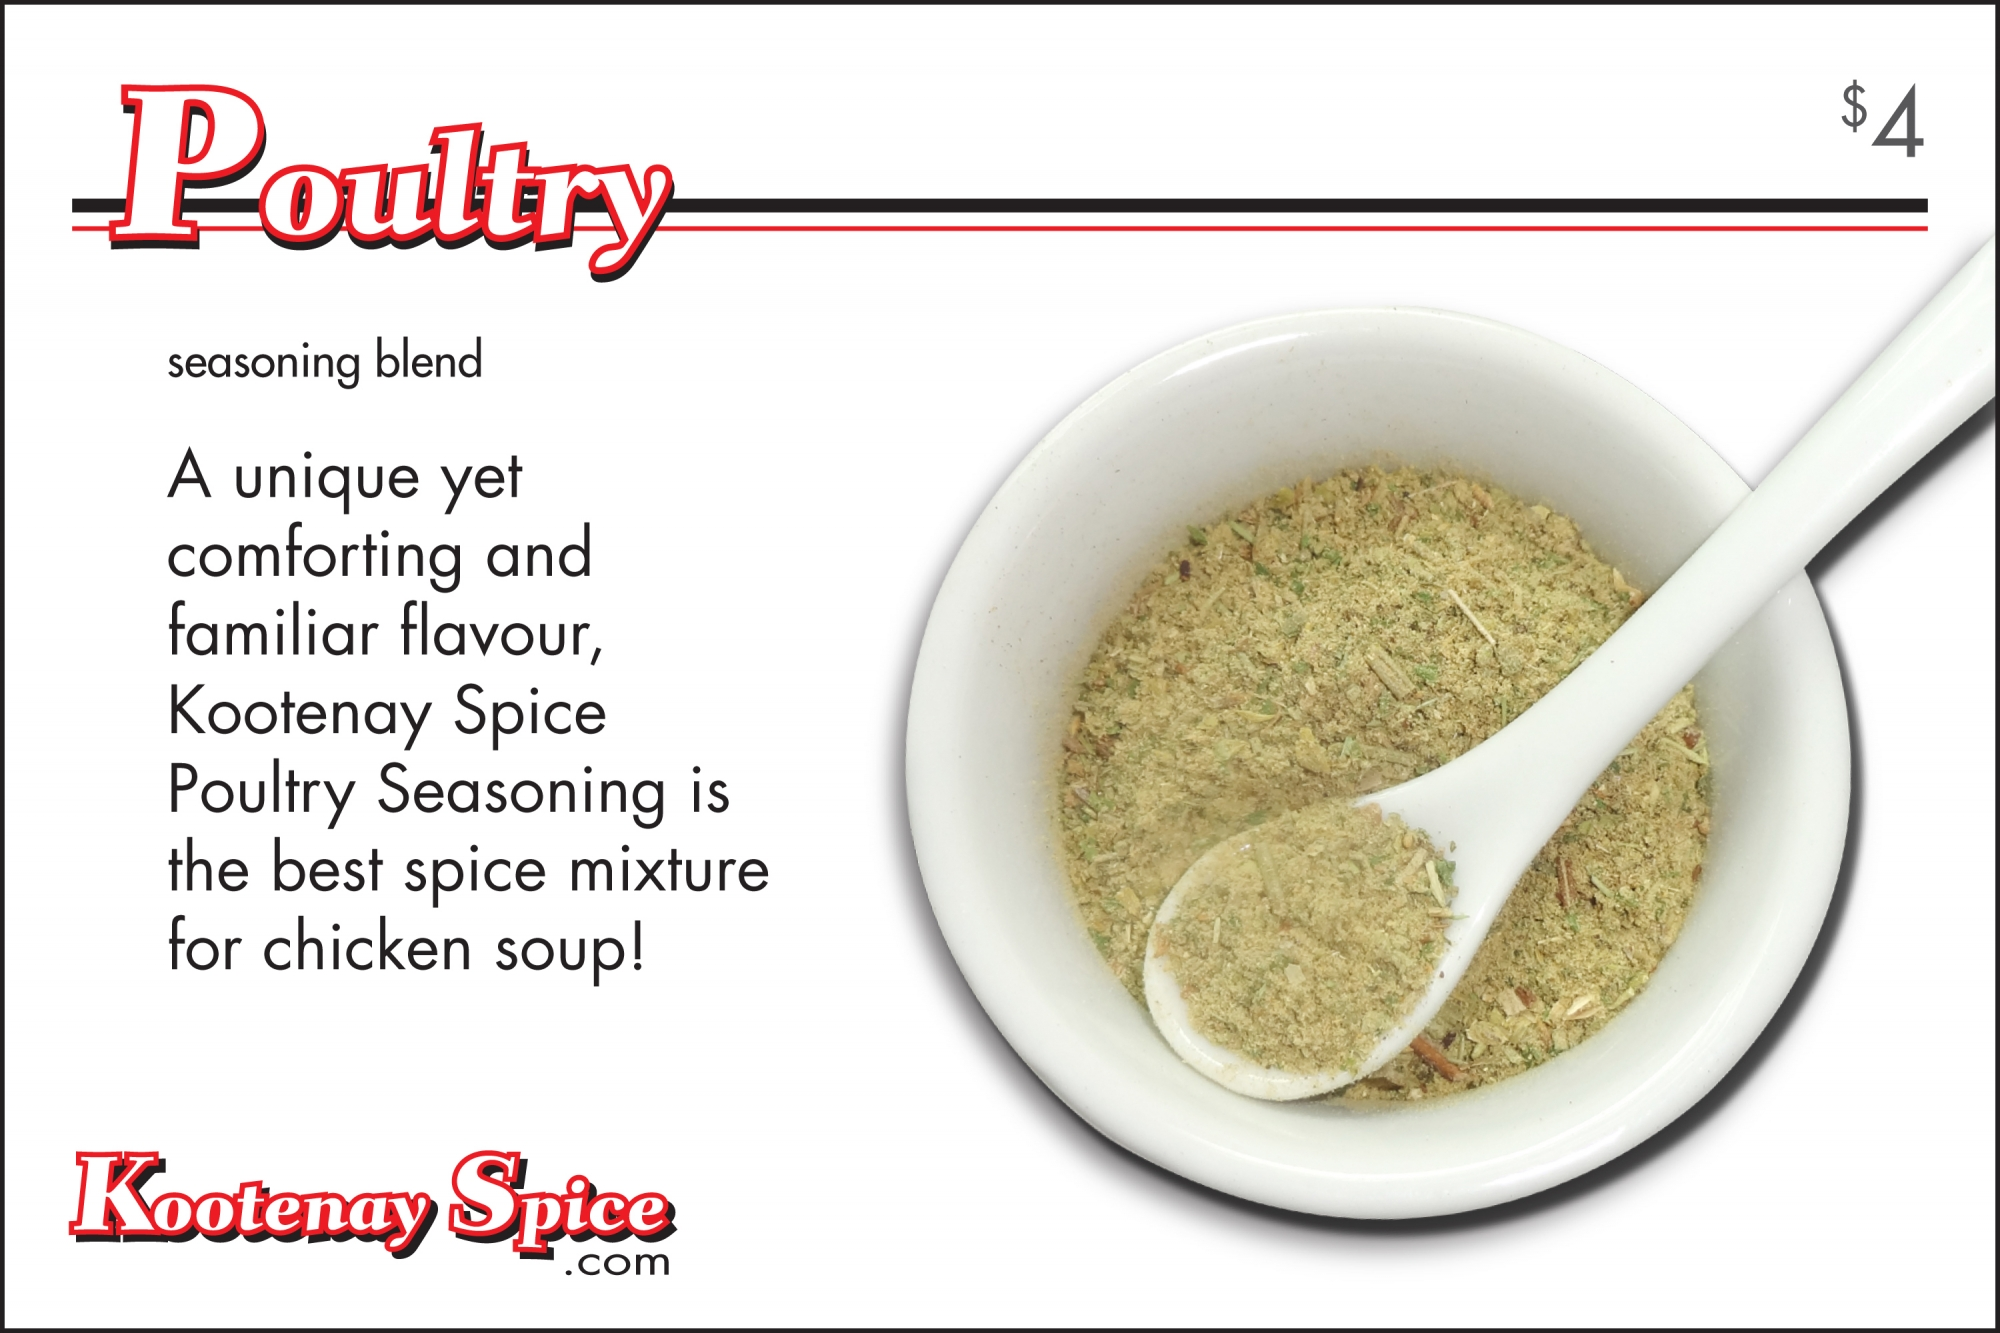 Kootenay Spice Poultry Seasoning